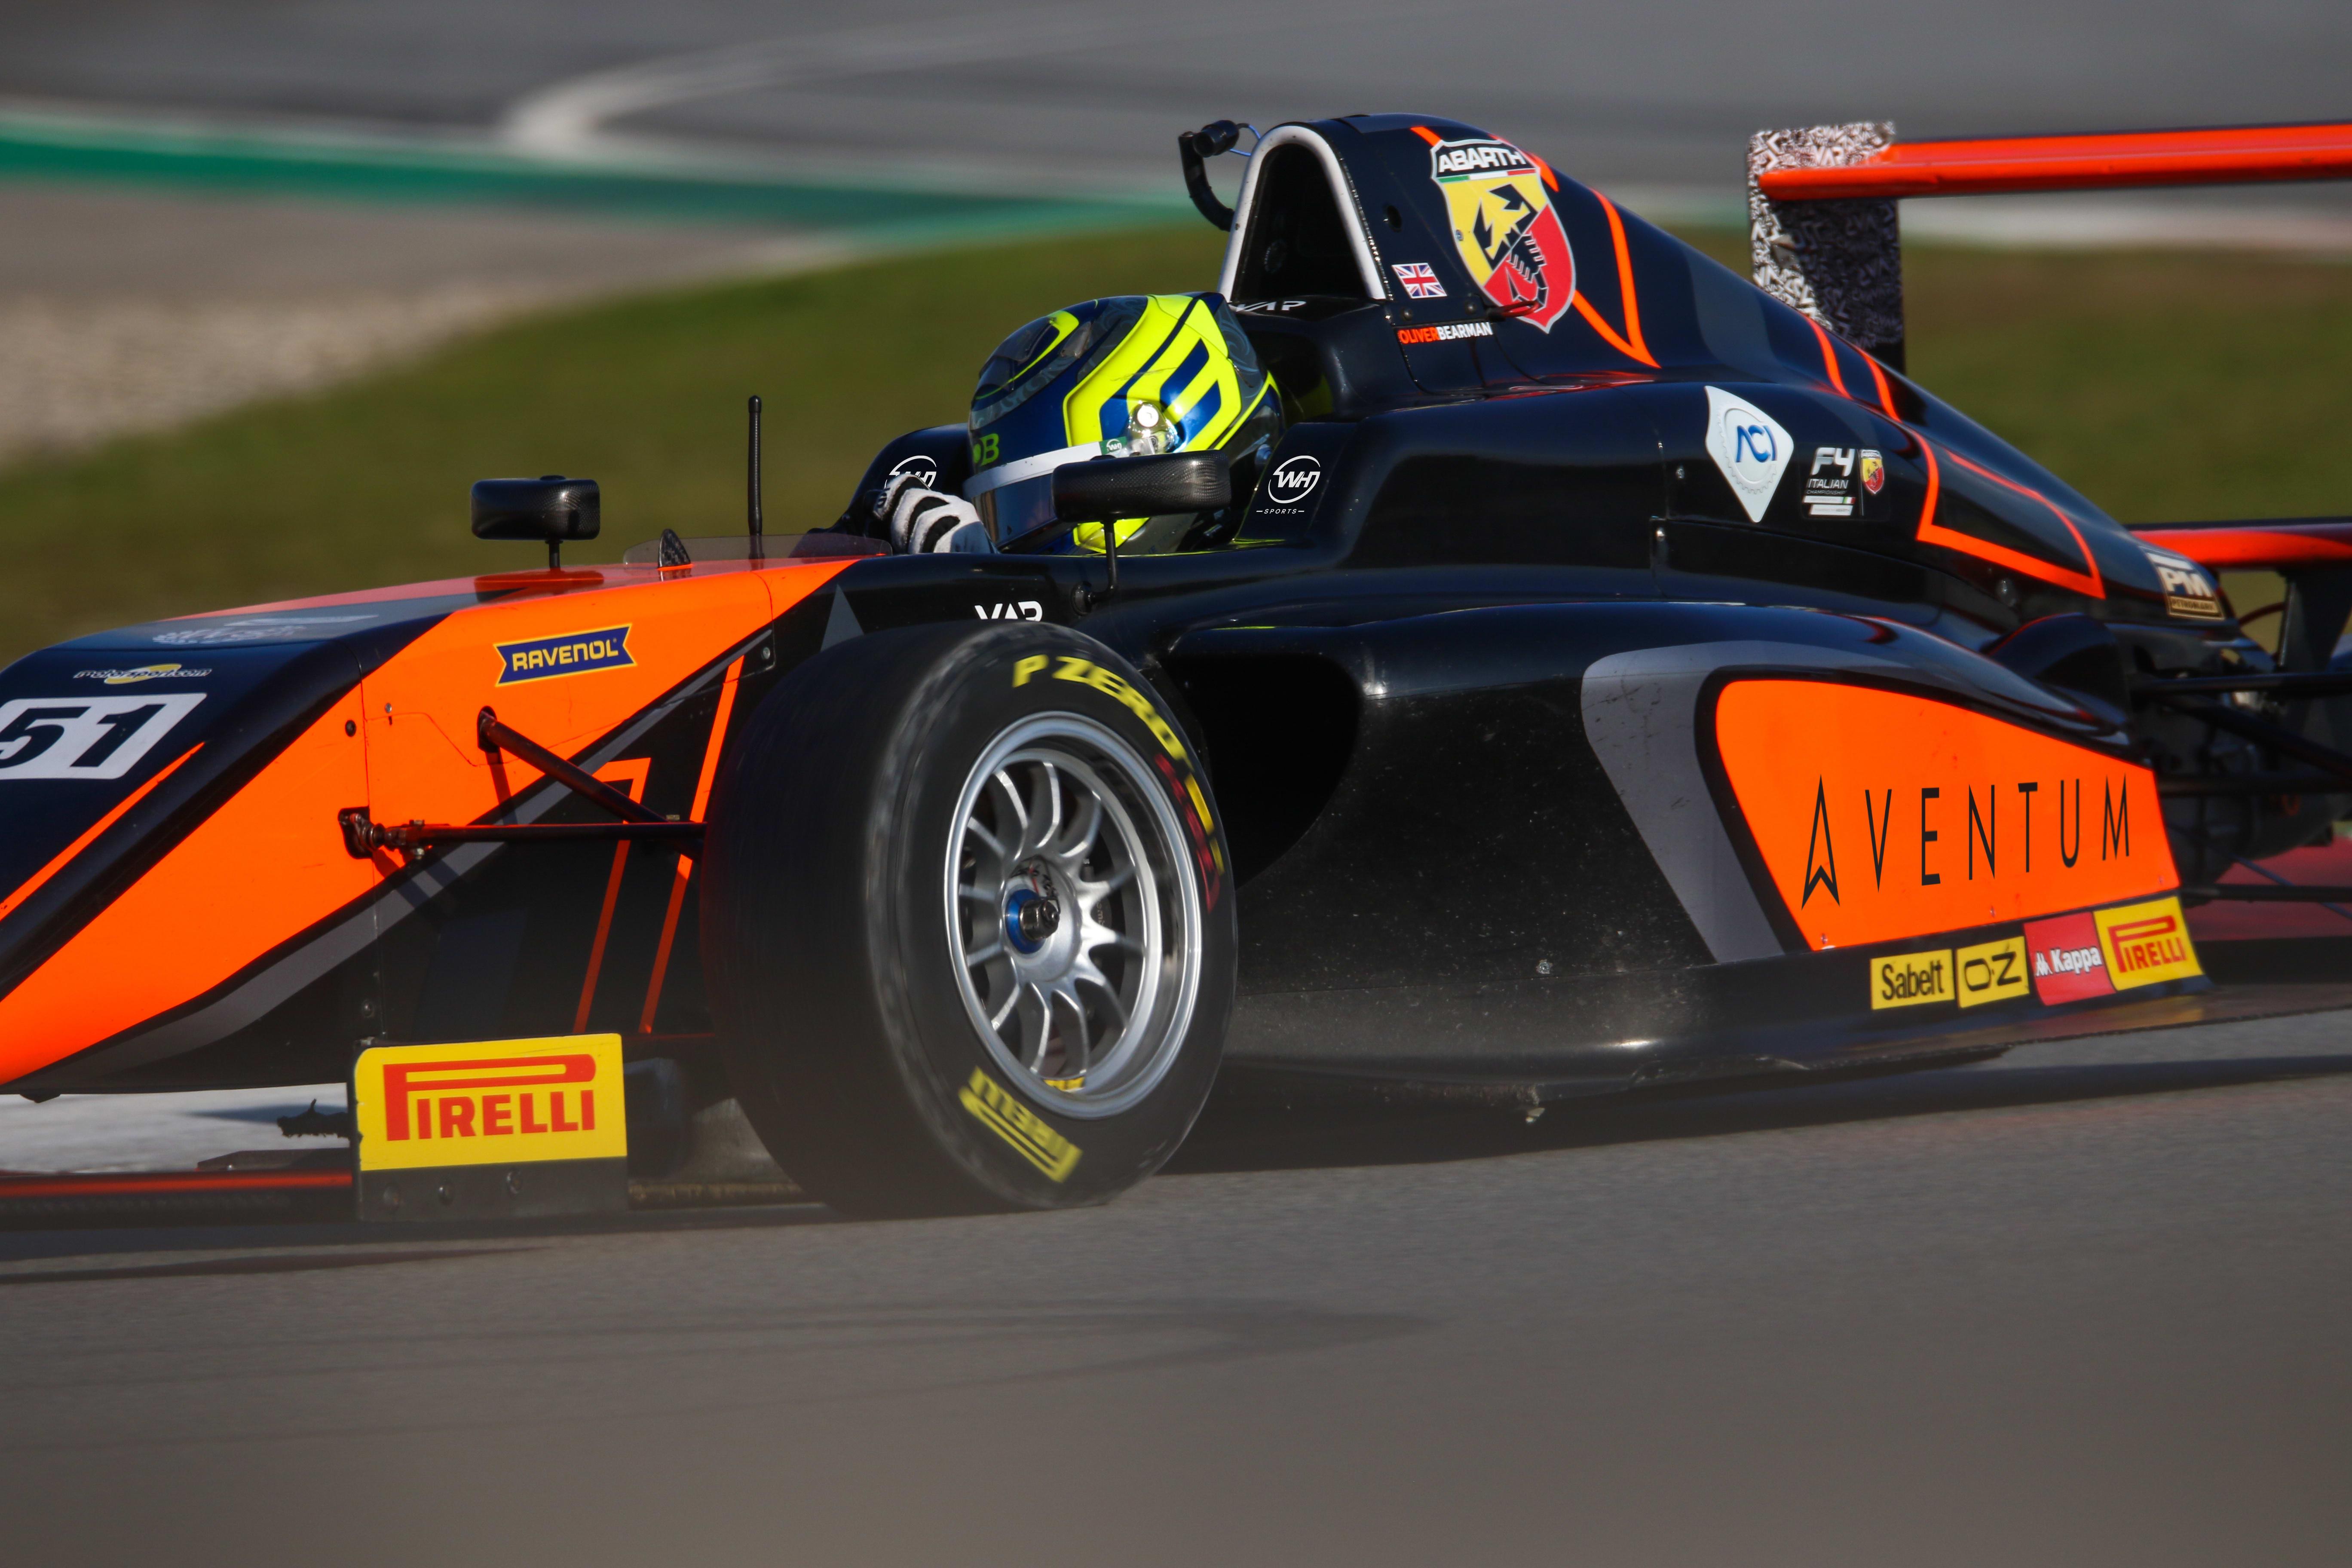 Titel im Blick: Bearman wechselt zu Van Amersfoort Racing